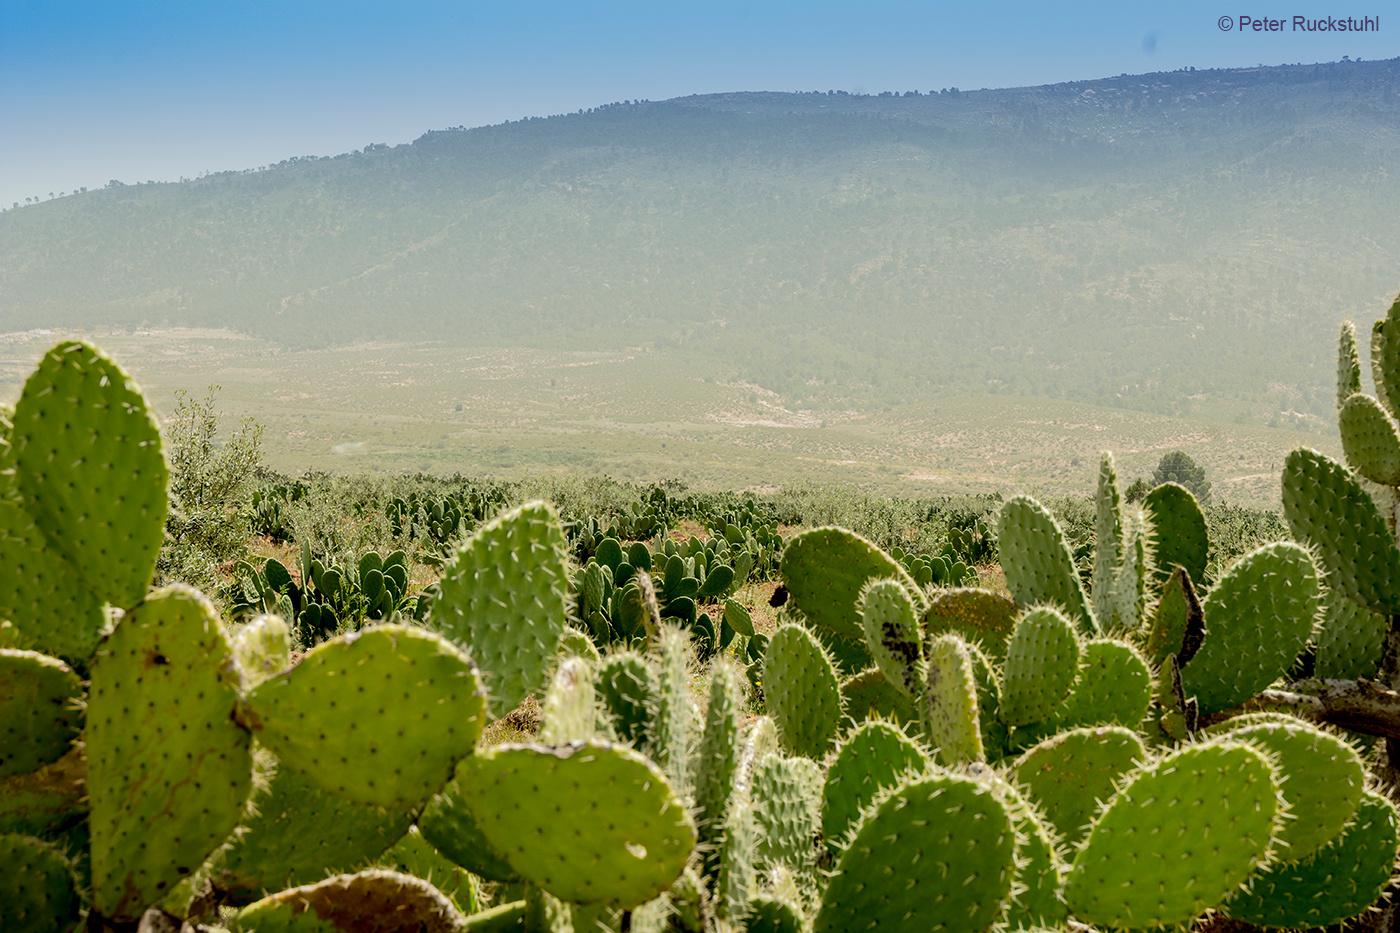 Kaktusfeigen Plantage